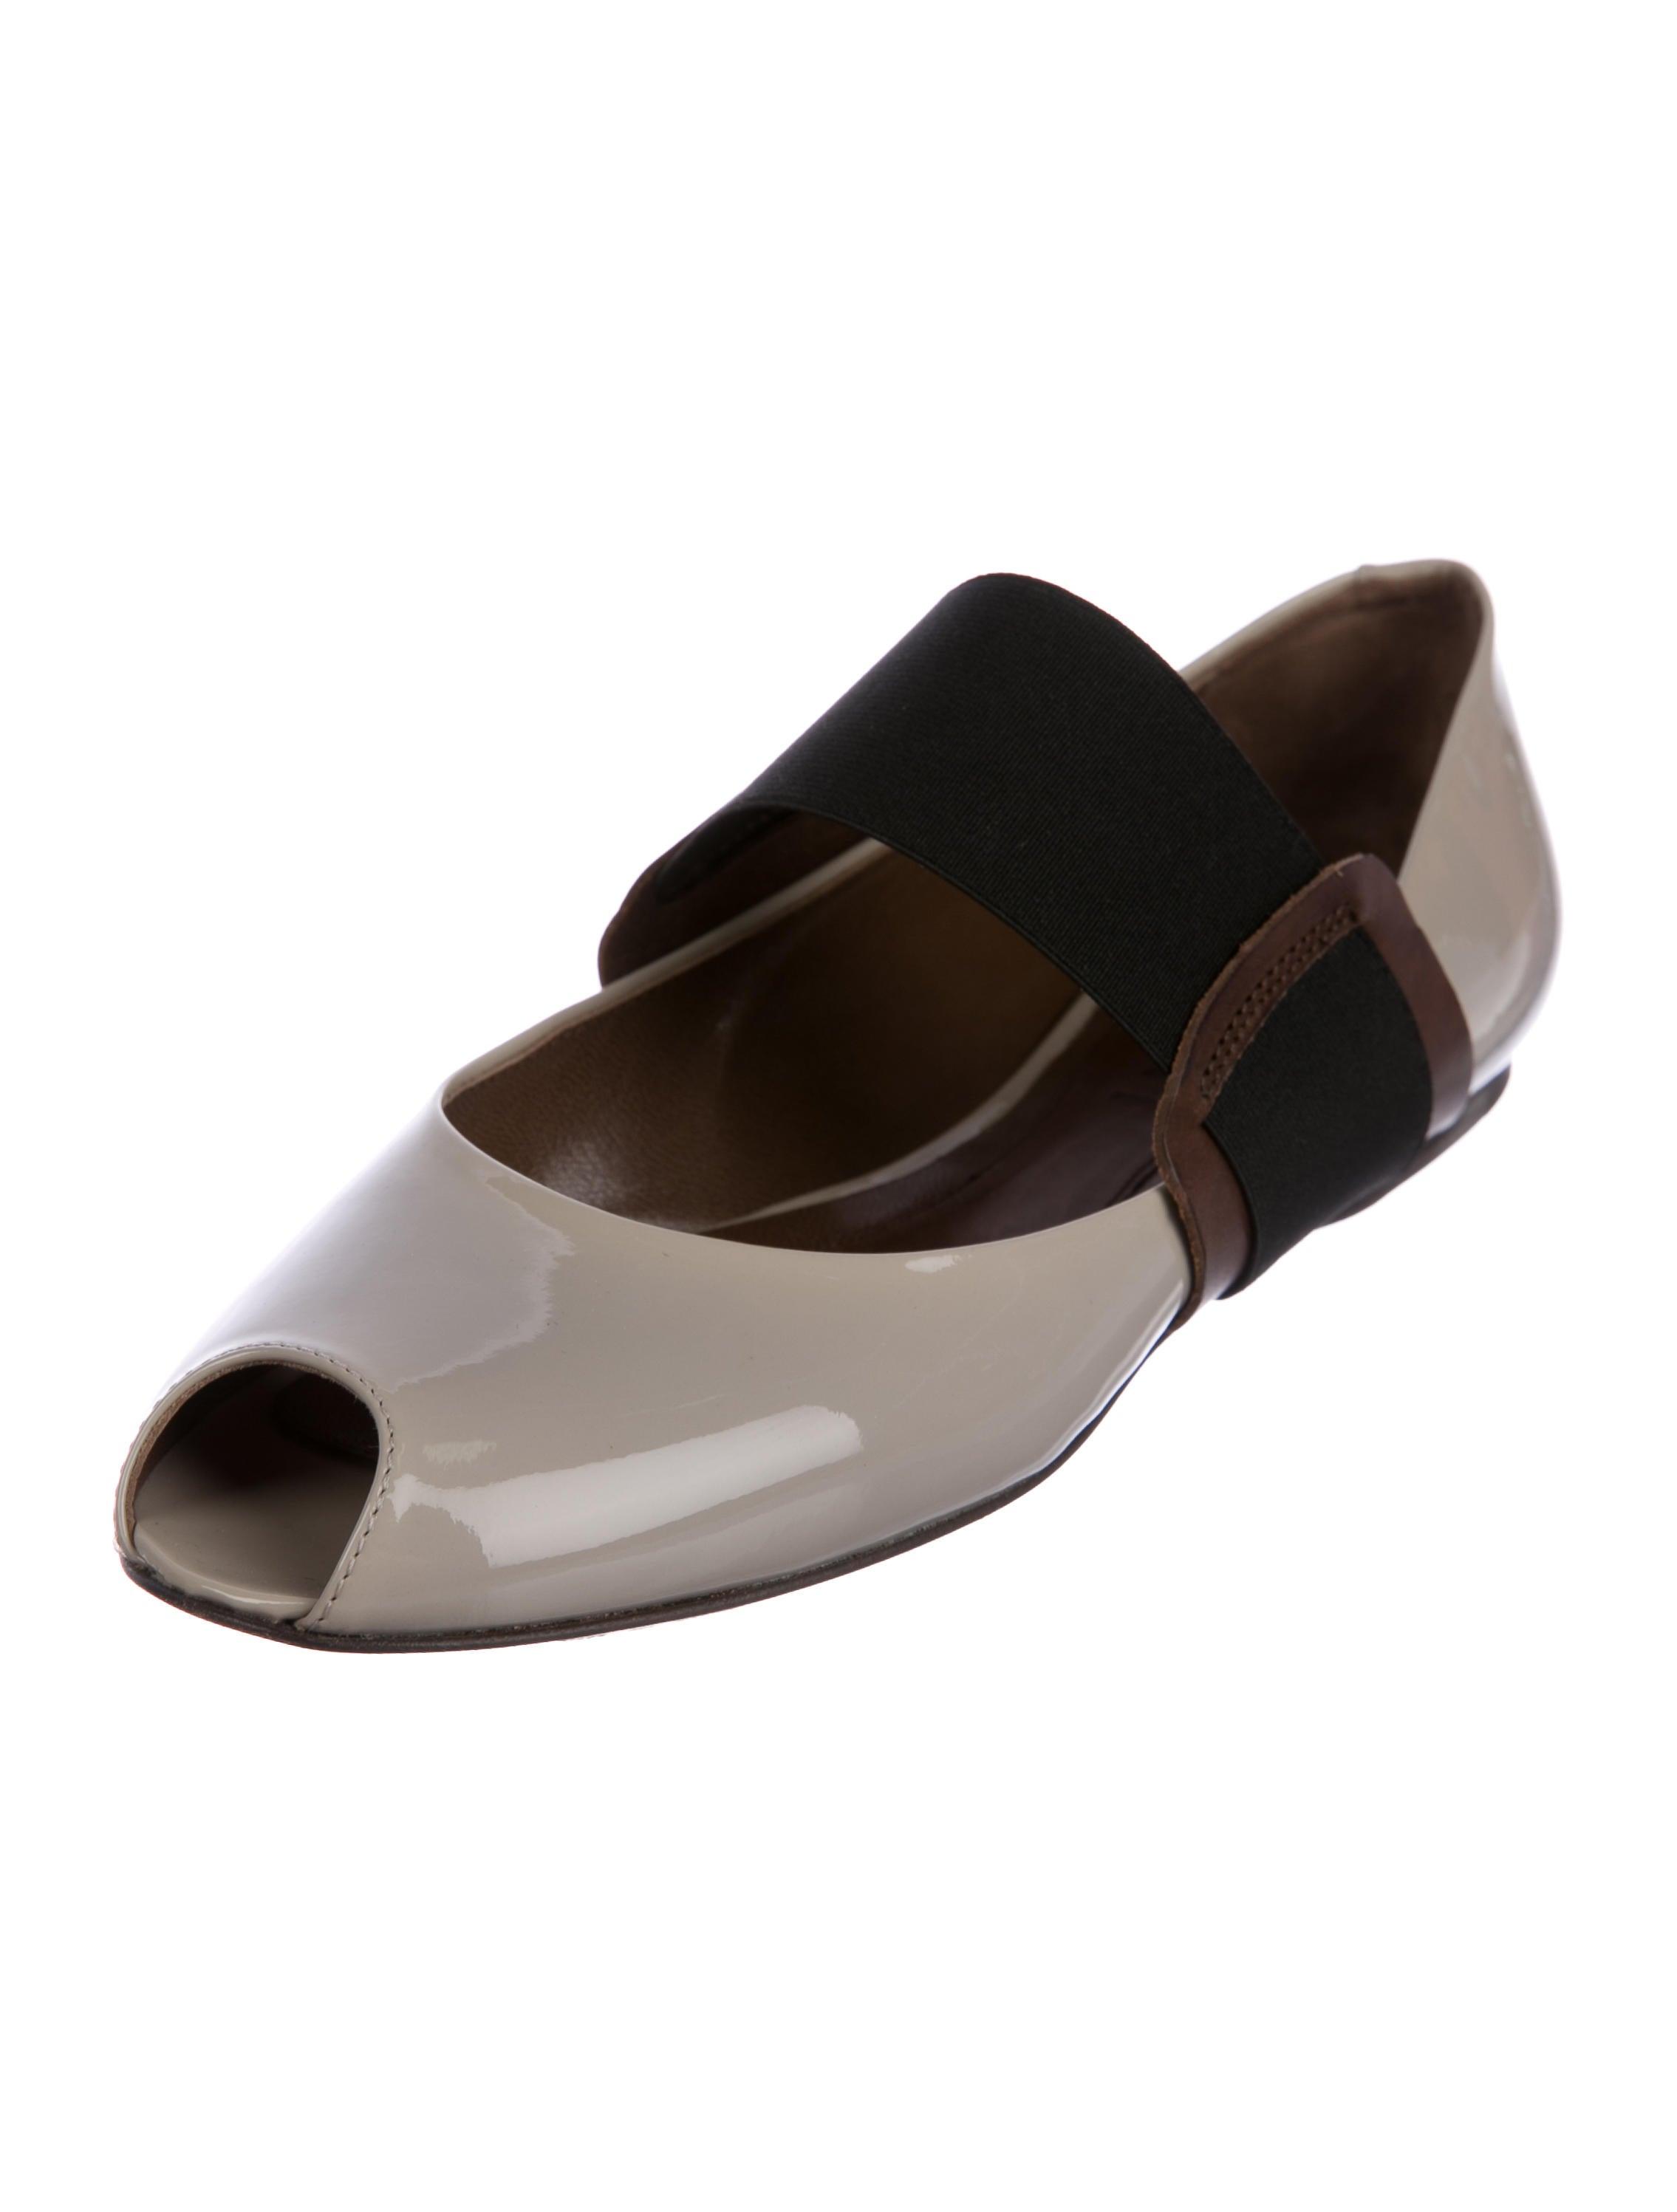 Marni Patent Leather Peep-Toe Flats Inexpensive online Fwu5vmbR